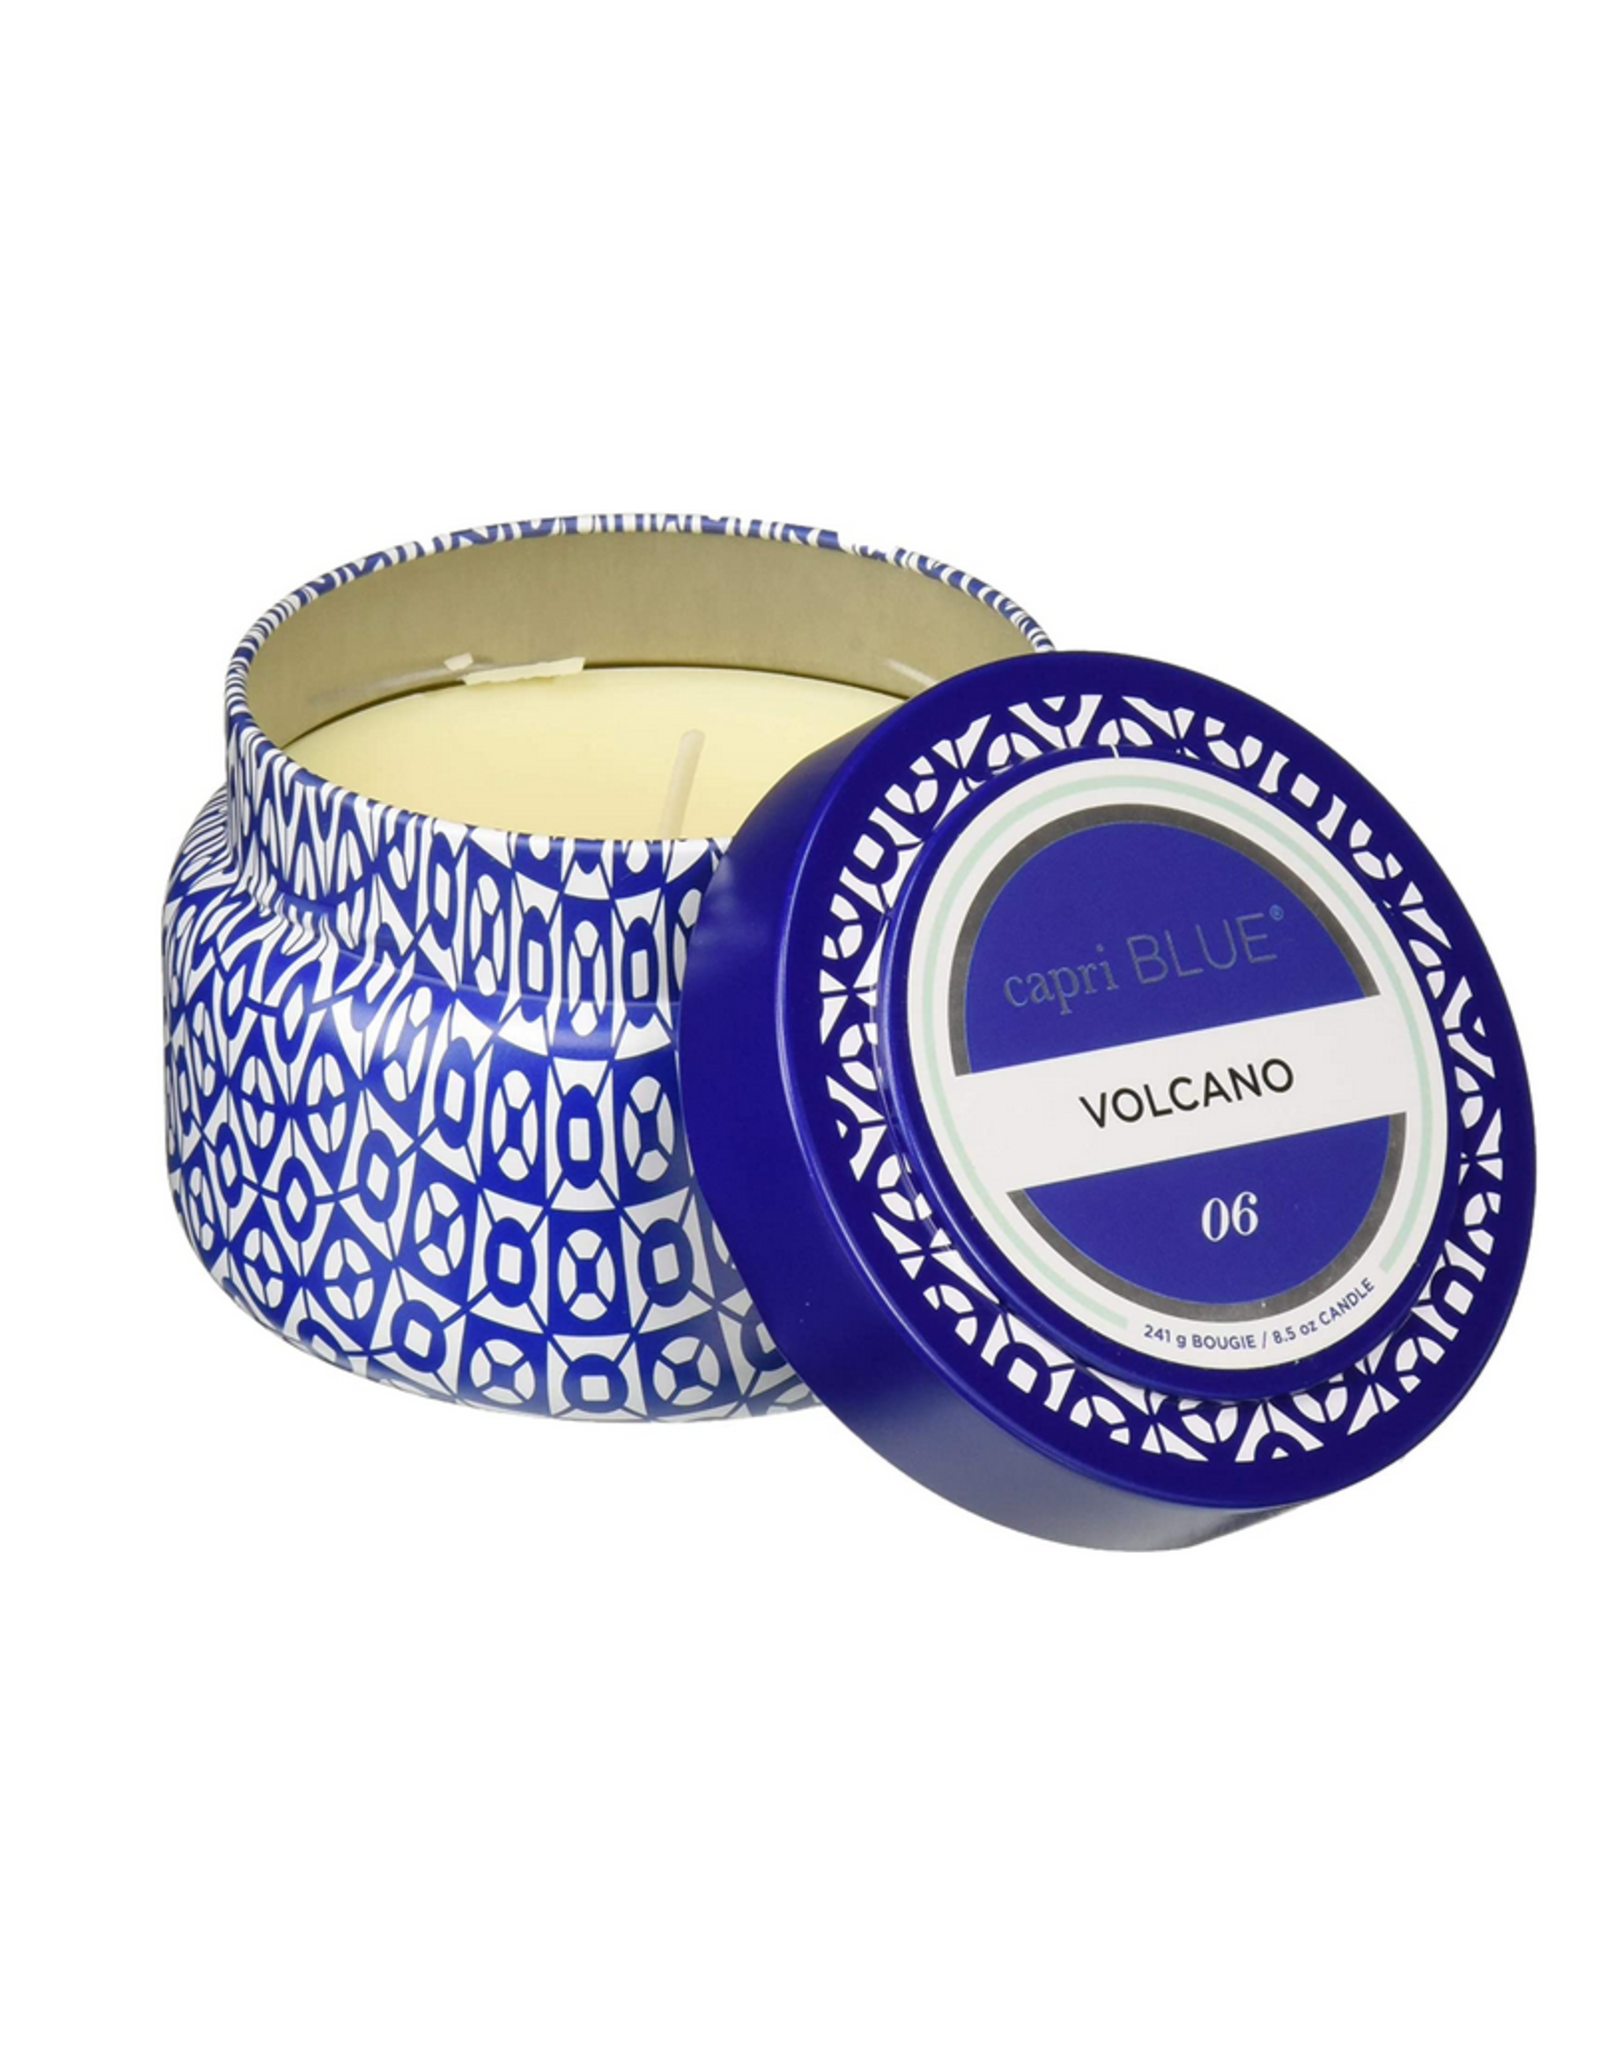 Capri Blue Volcano Blue Printed Travel Tin